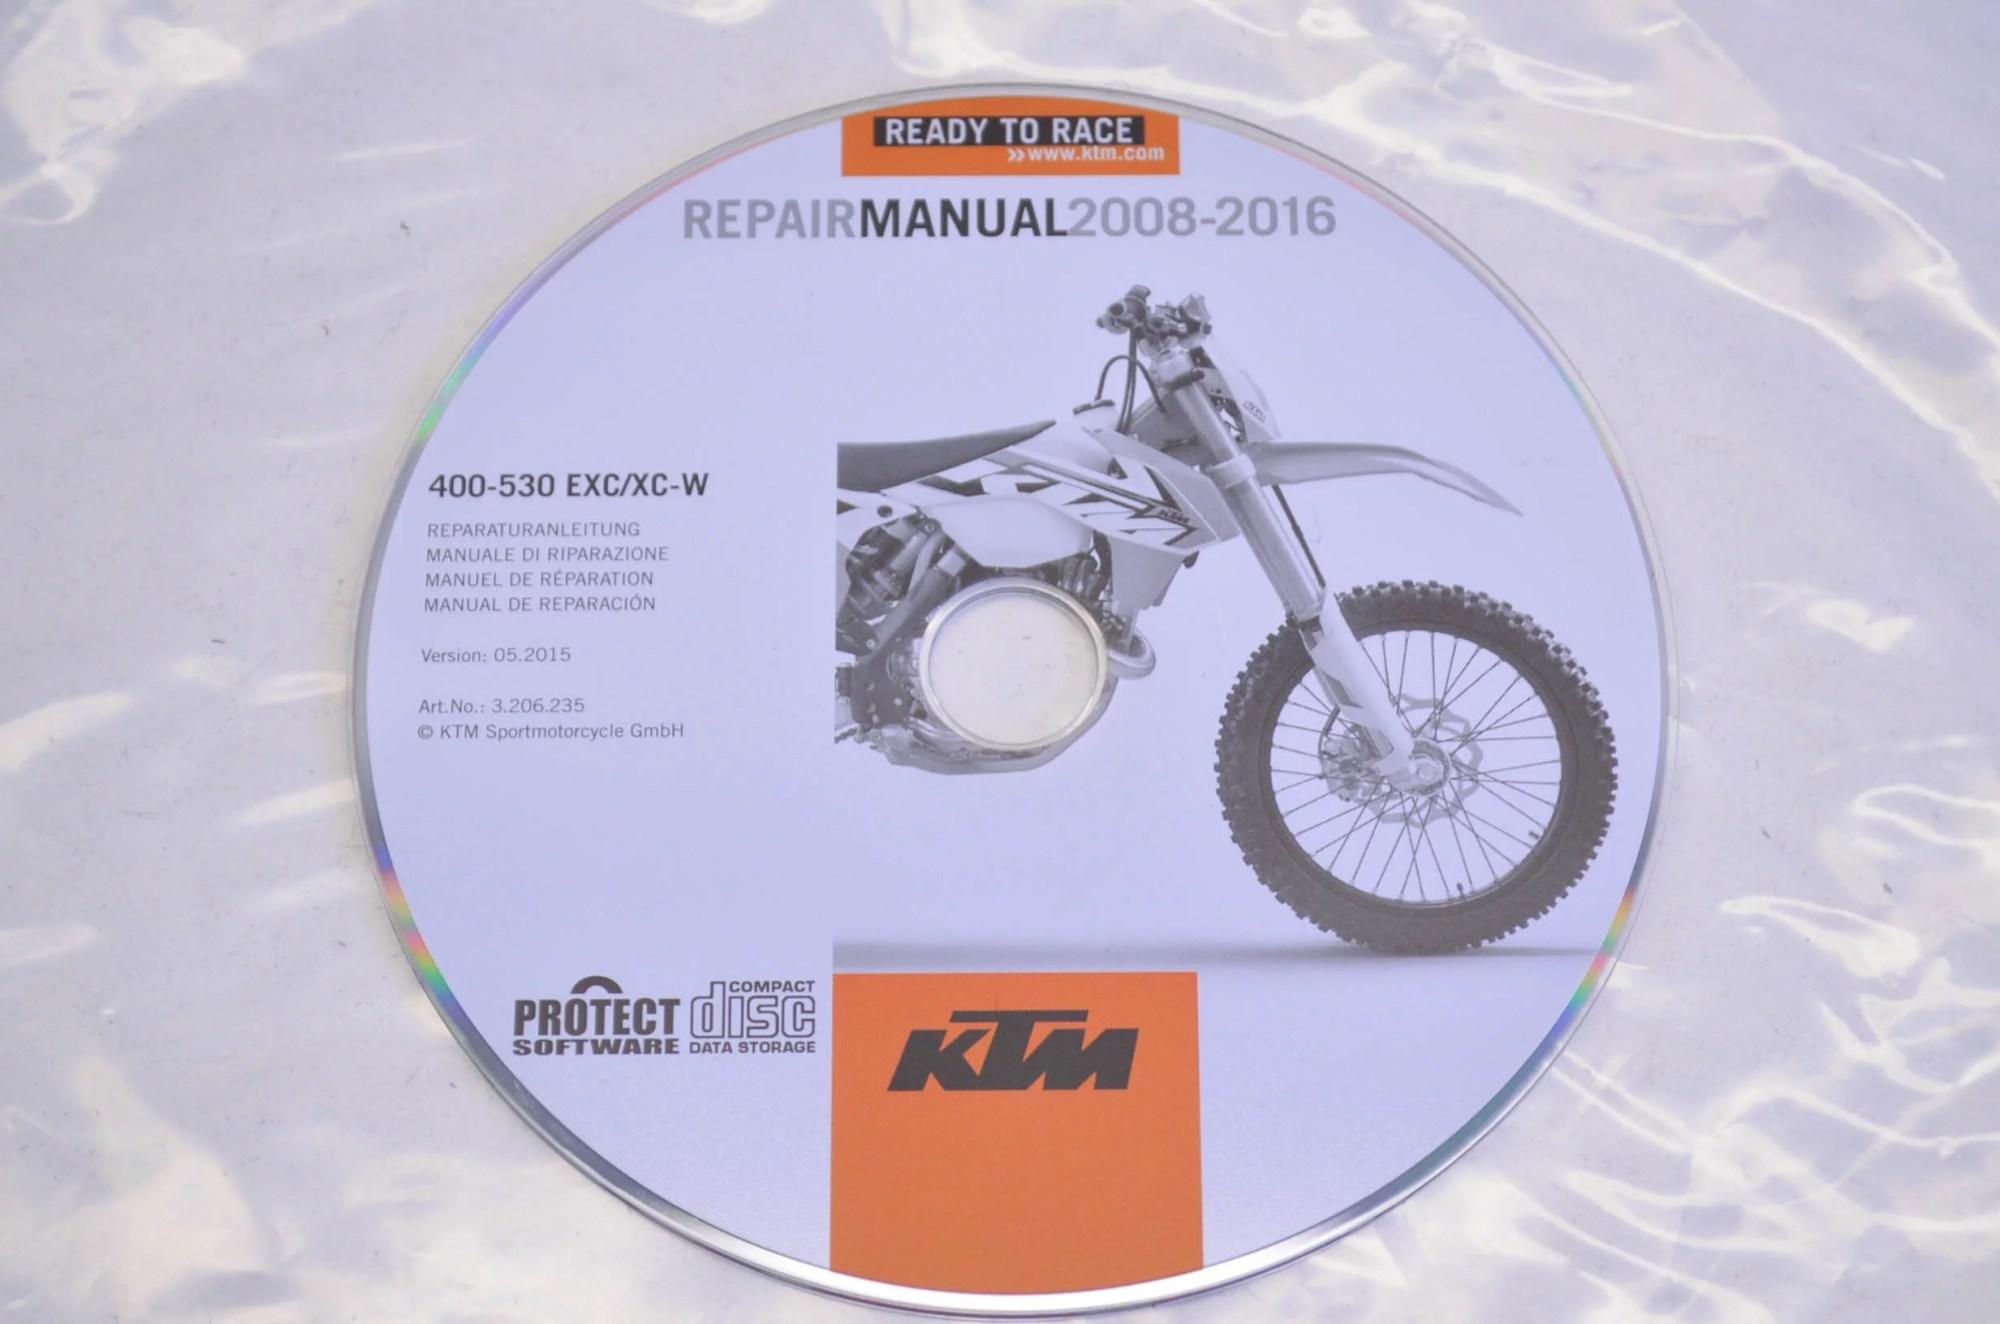 hight resolution of ktm 3206235 2008 2016 400 530 exc xc w repair manual cd disc qty 1 walmart com